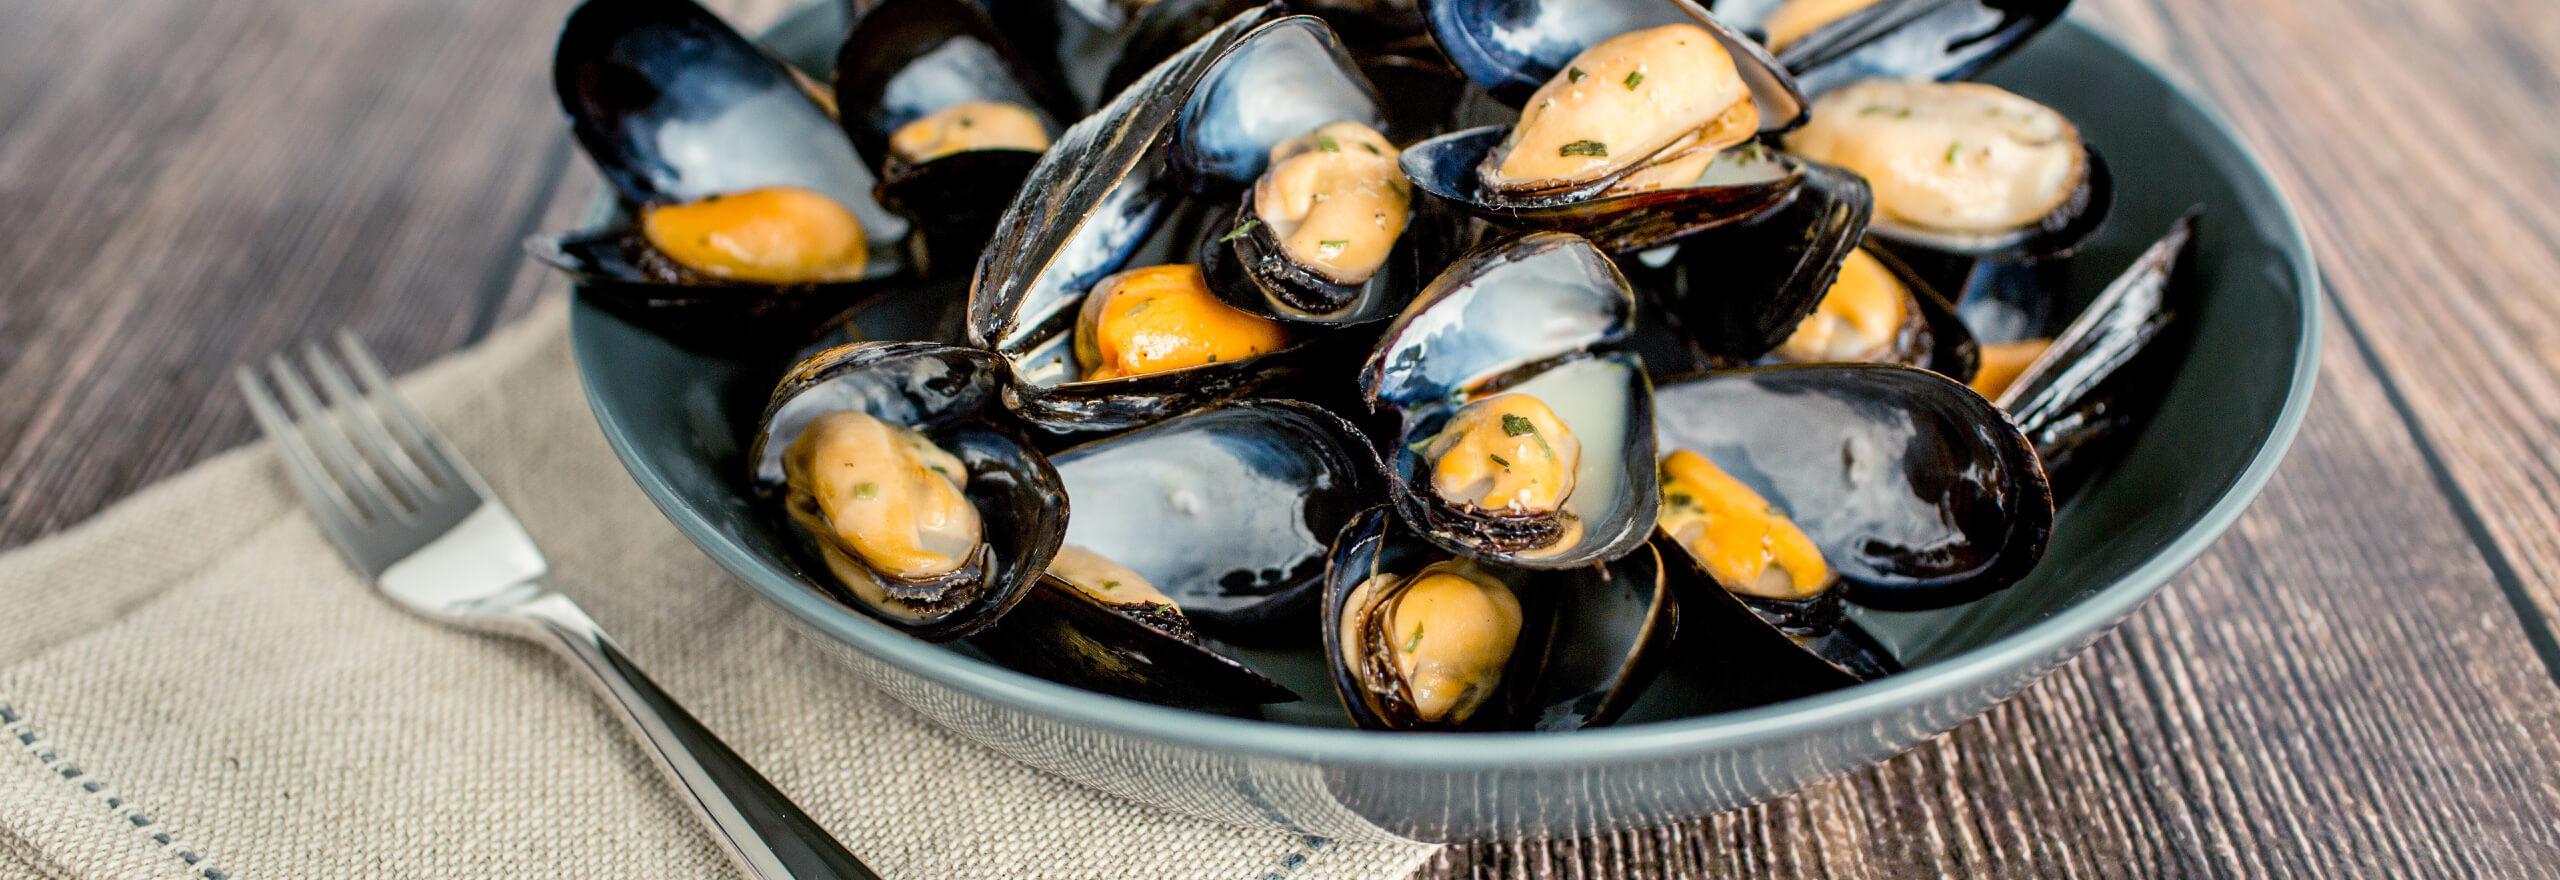 Seafood Retail Marketing Atlantic Canada